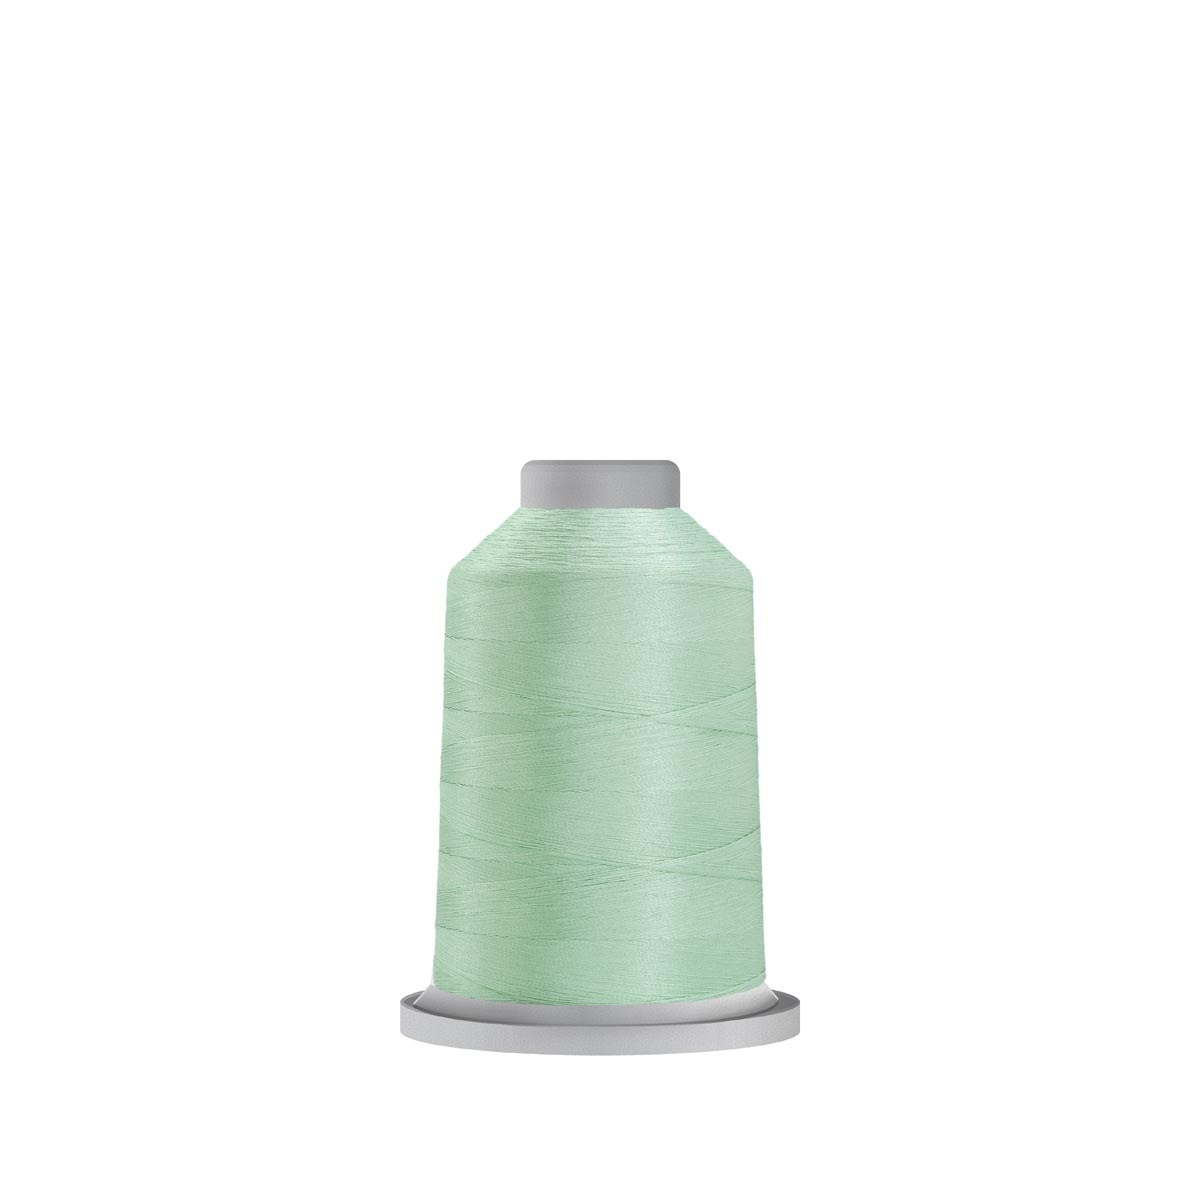 Glide Trilobal Polyester No. 40 Thread - Mint Julep